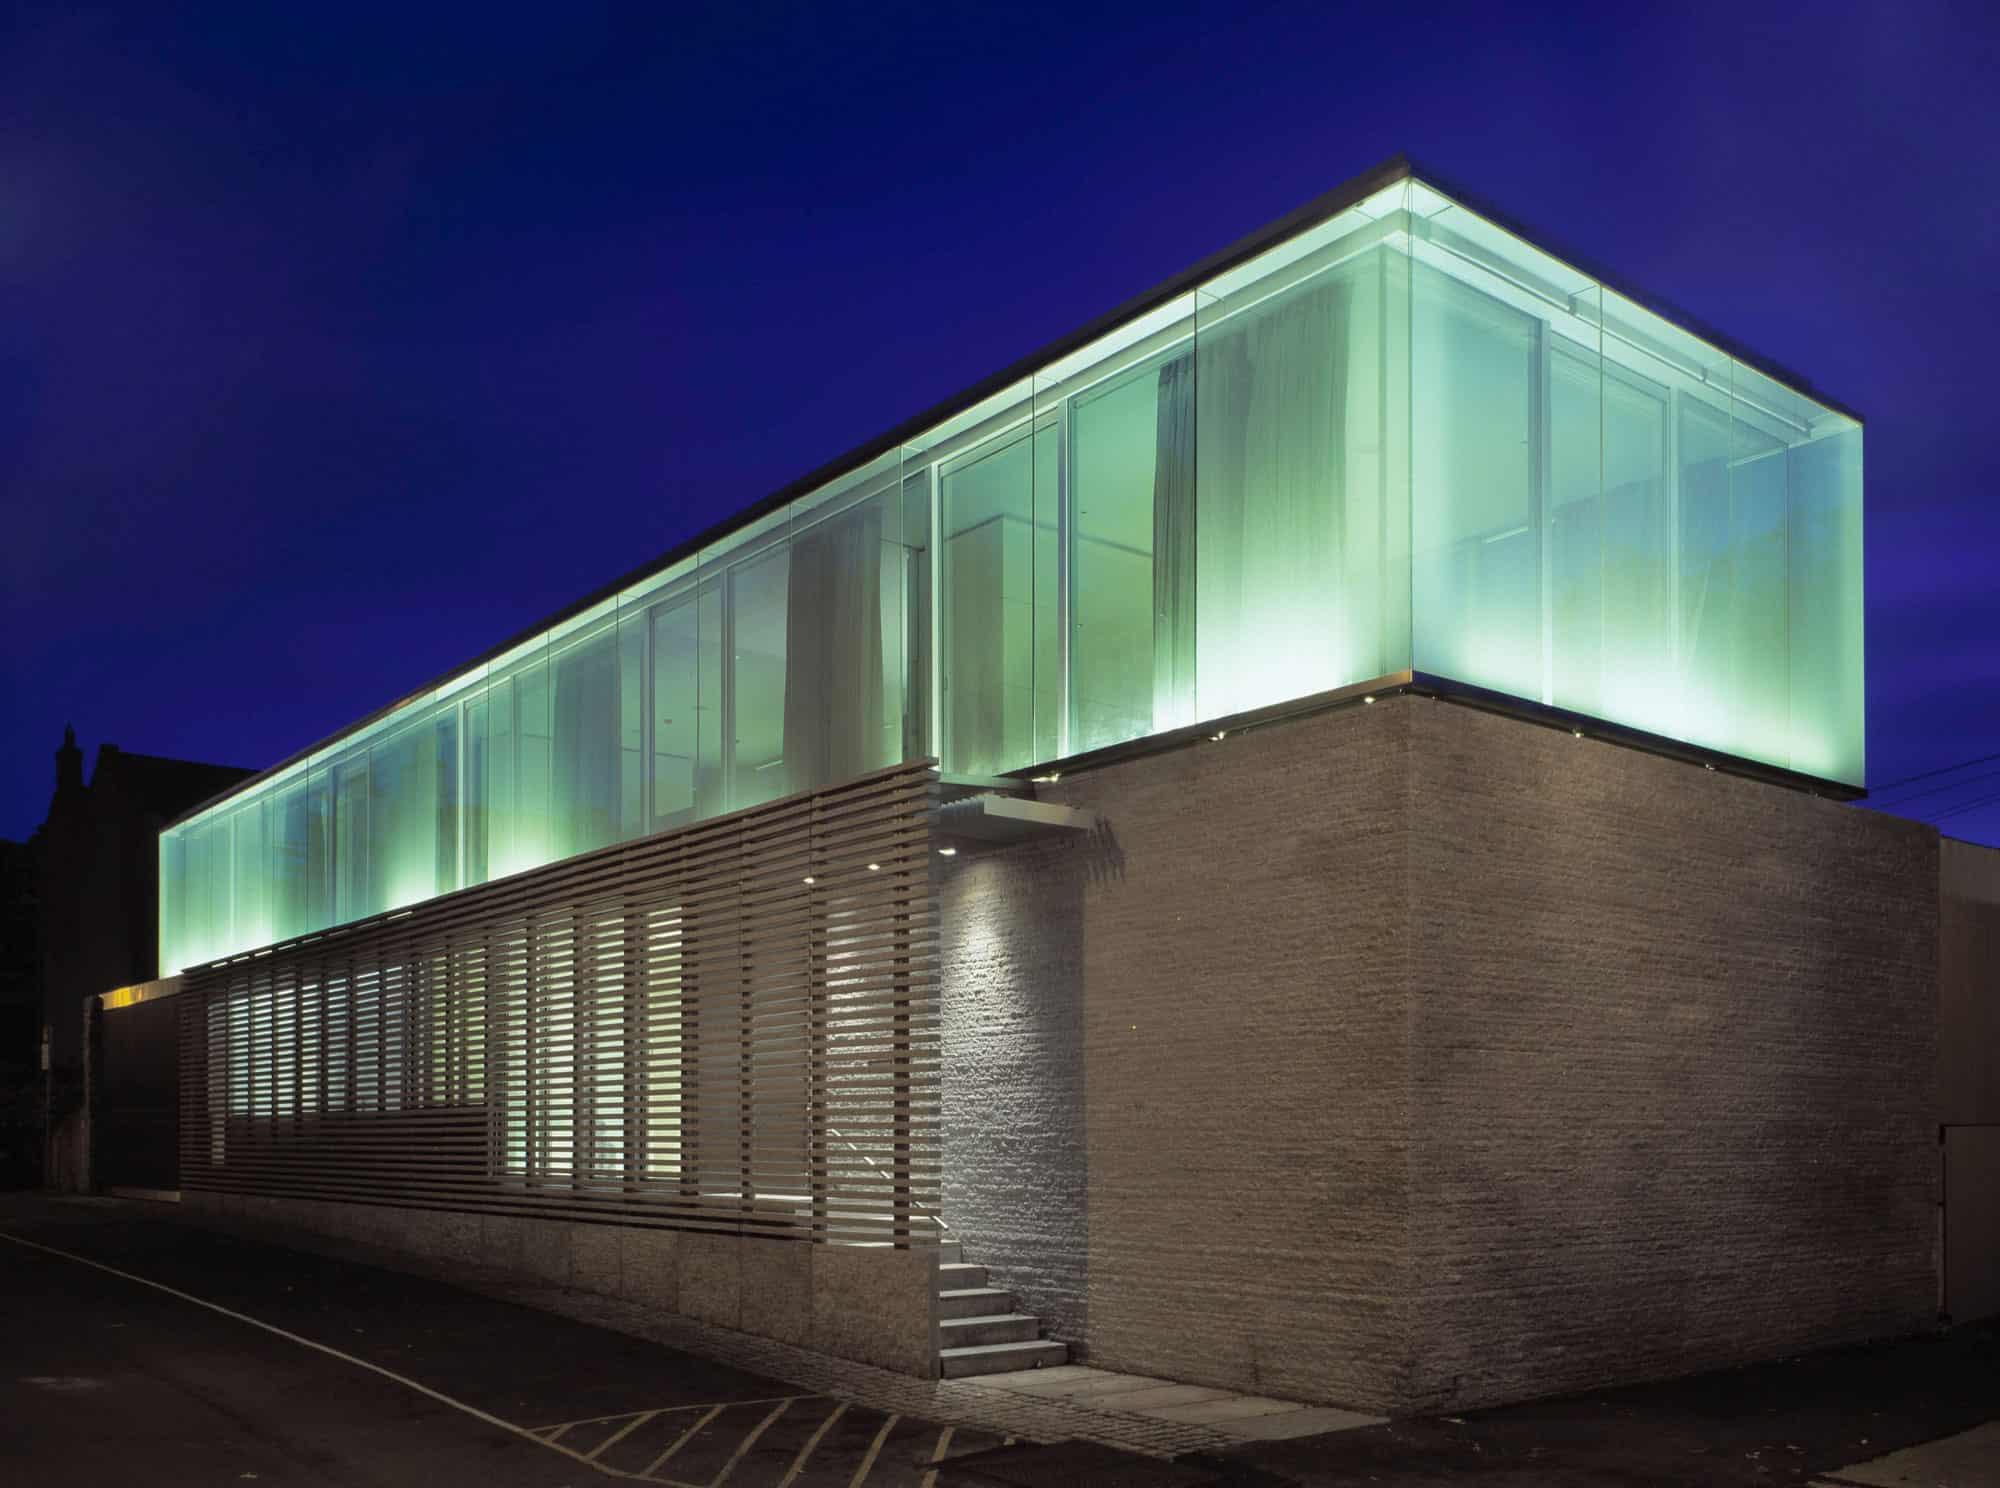 Burren House by Níall McLaughlin Architects